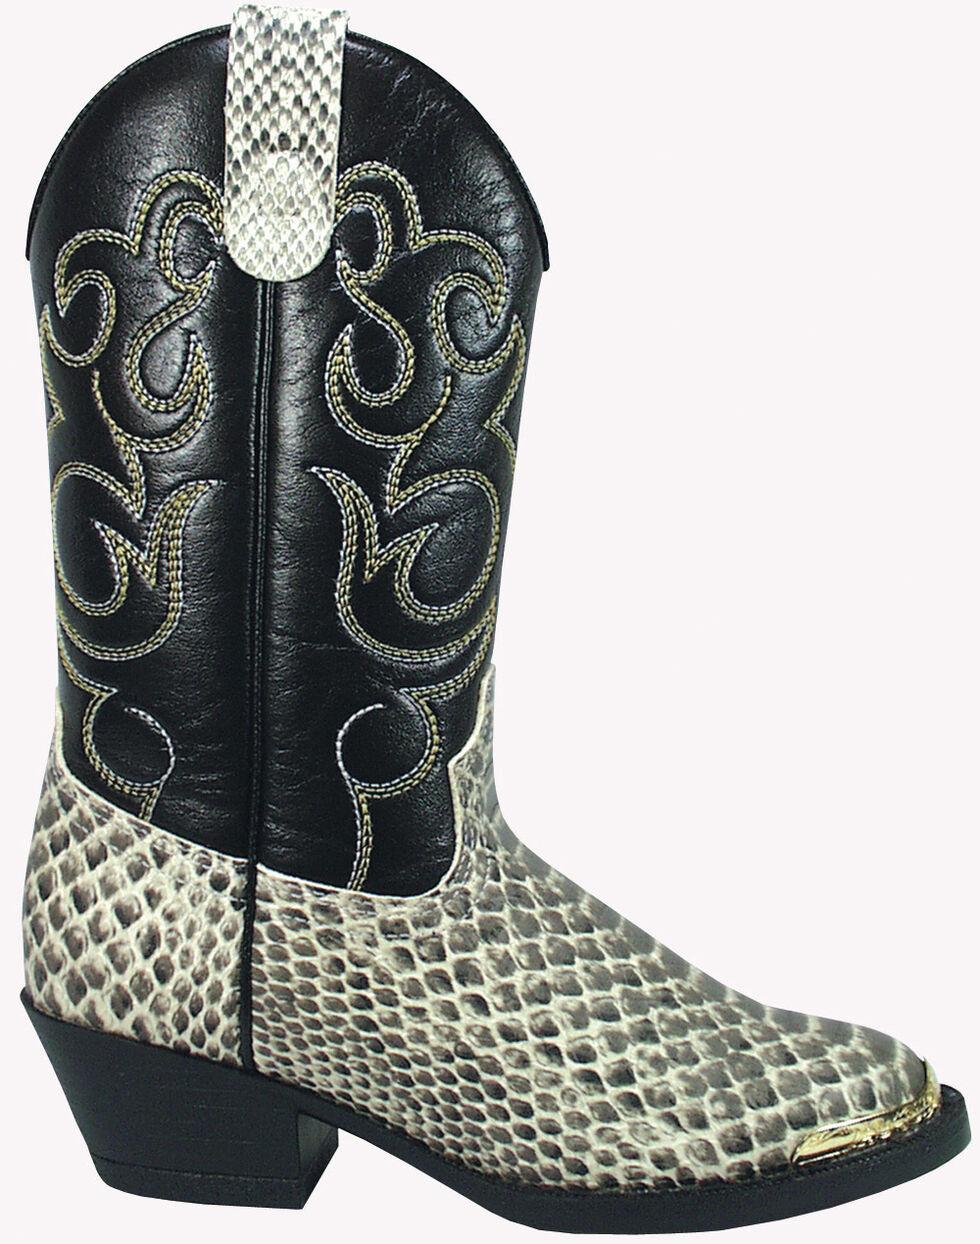 Smoky Mountain Toddler Boys' Laramie Python Print Western Boots - Round Toe, Snake Print, hi-res